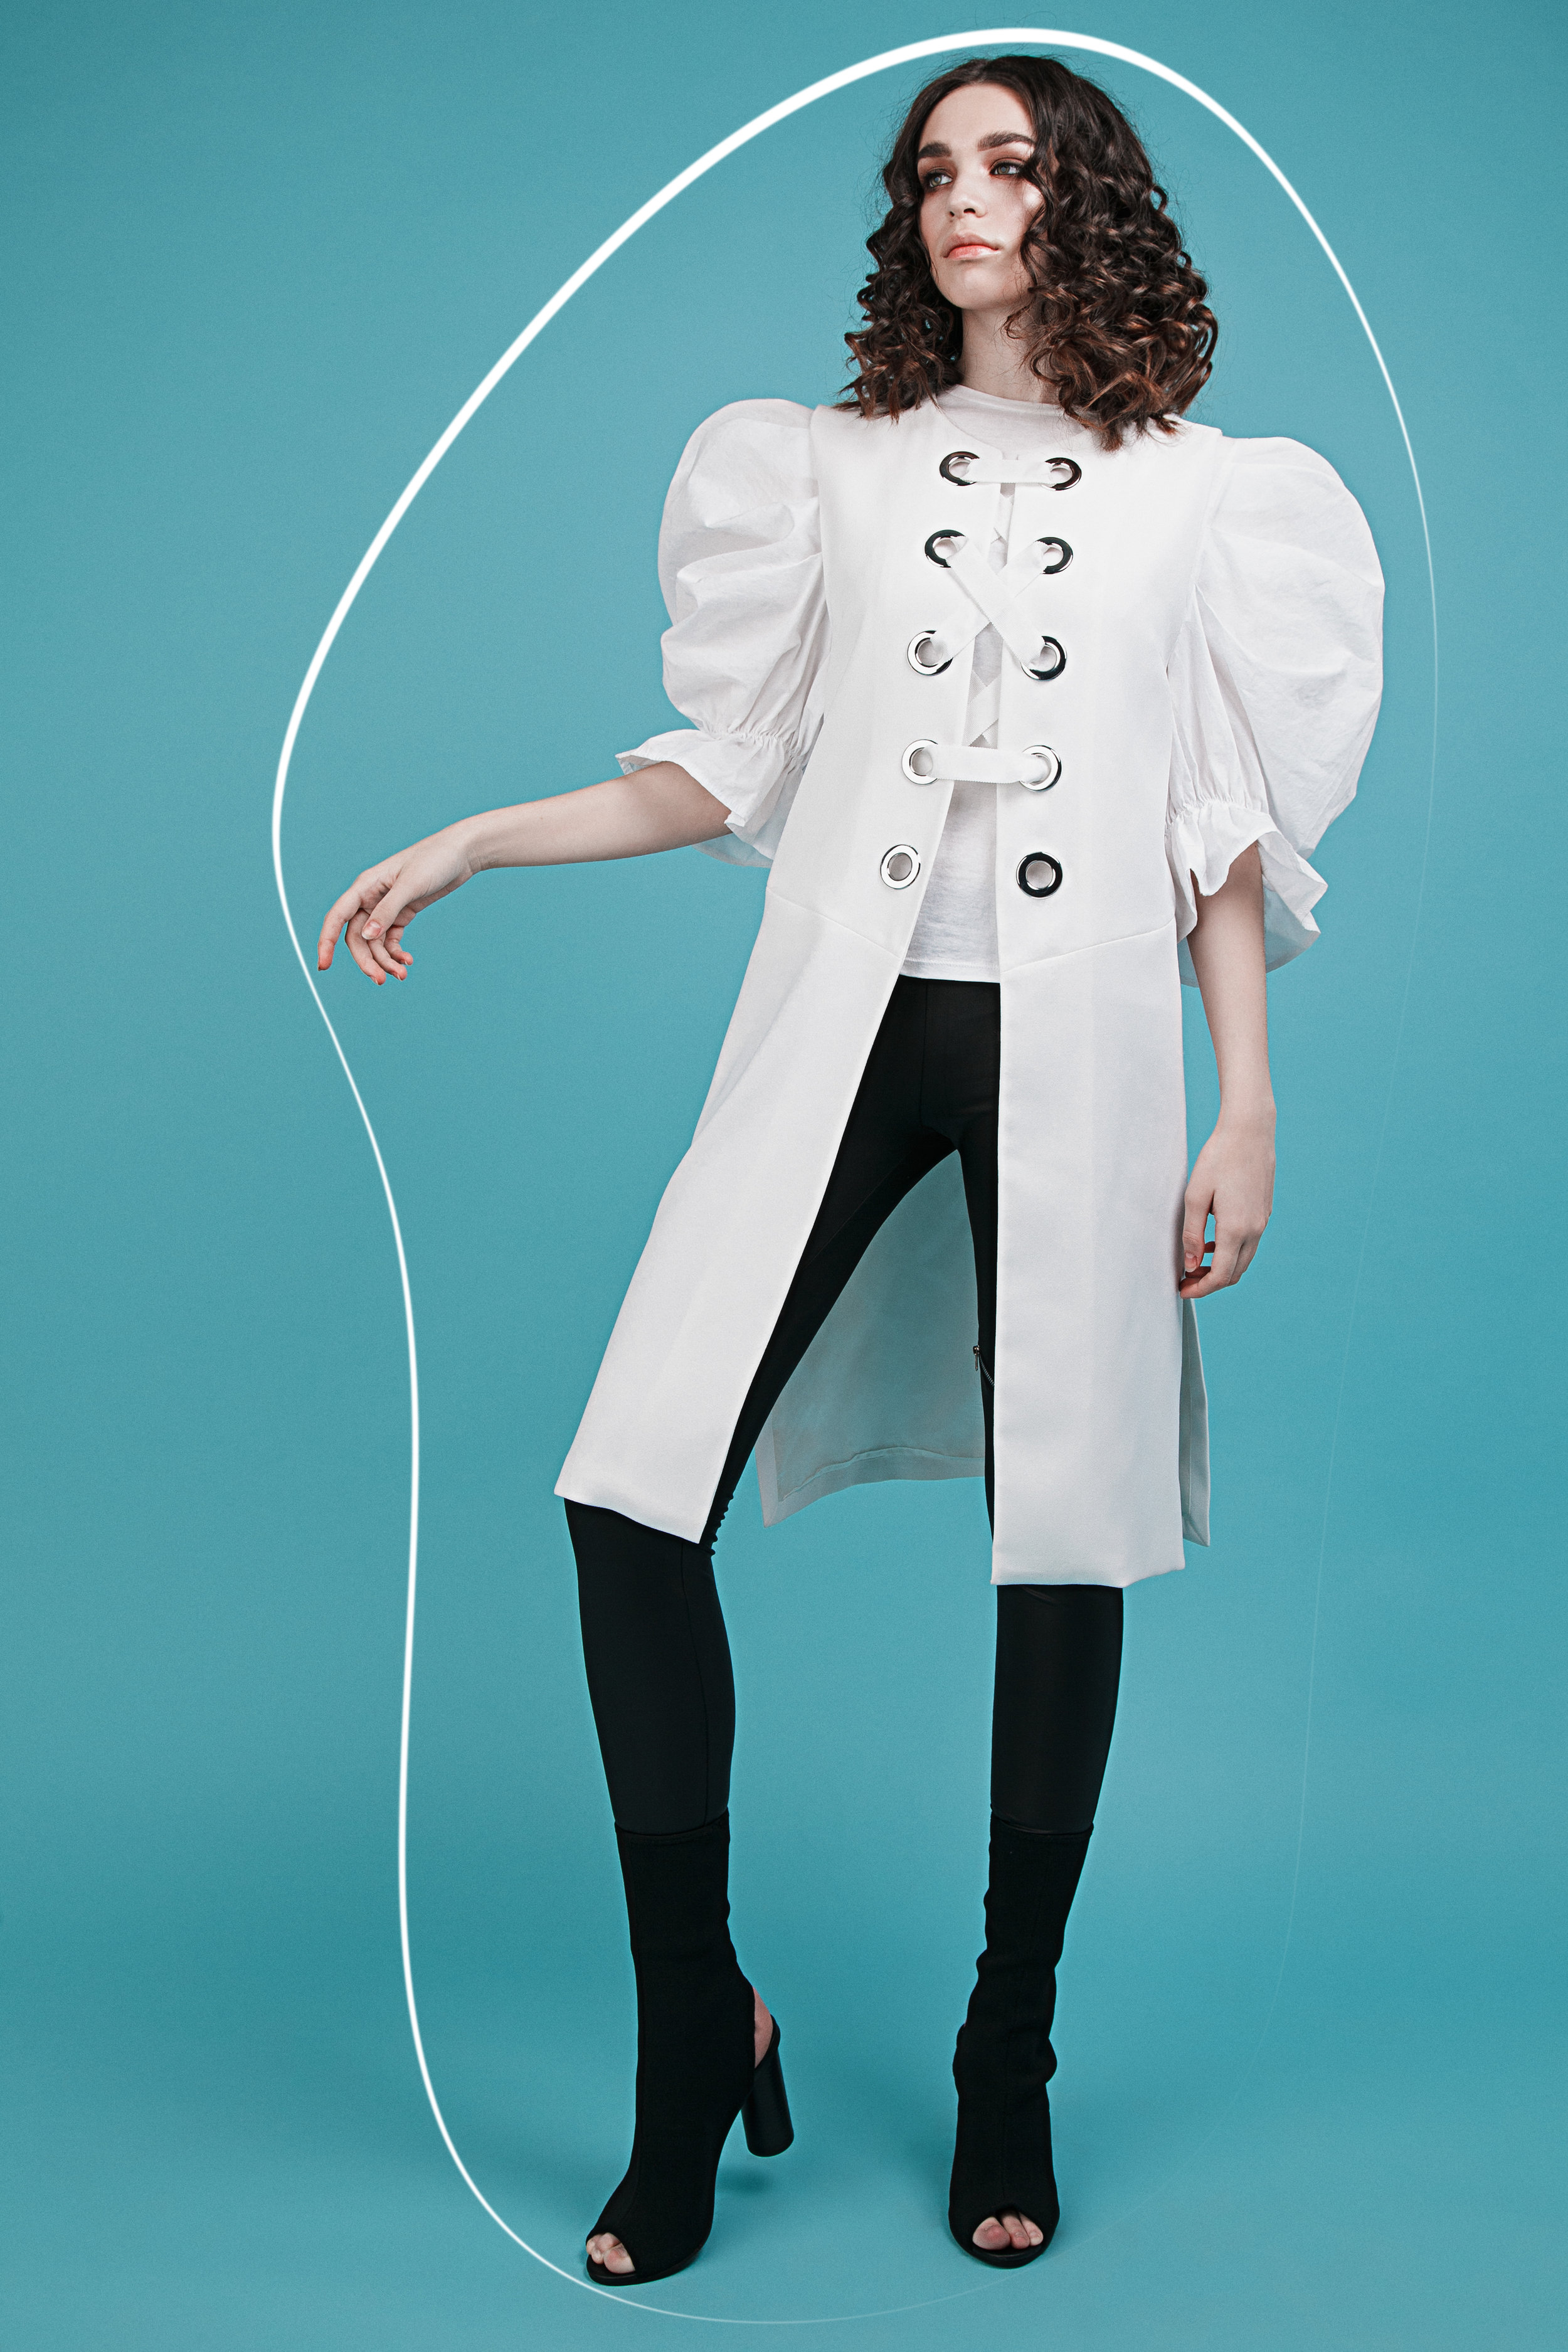 Vest Zara, Leggins Calzedonia, T-shirt Zara, Shoes H&M